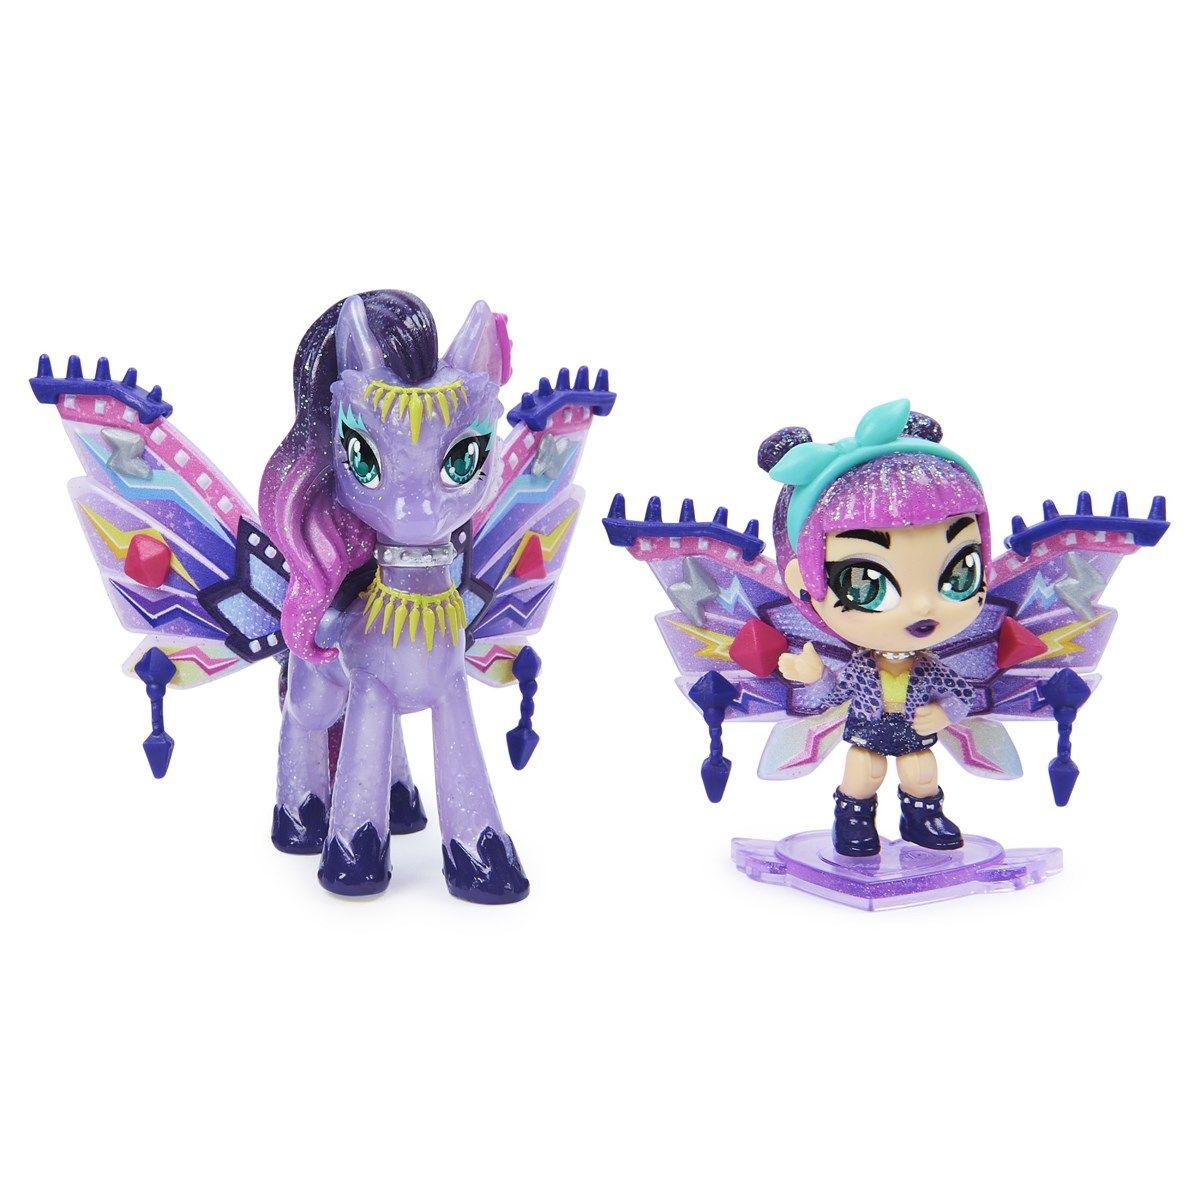 Hatchimals - Pixie Riders Wilder Wings - Ponygator (6059691)